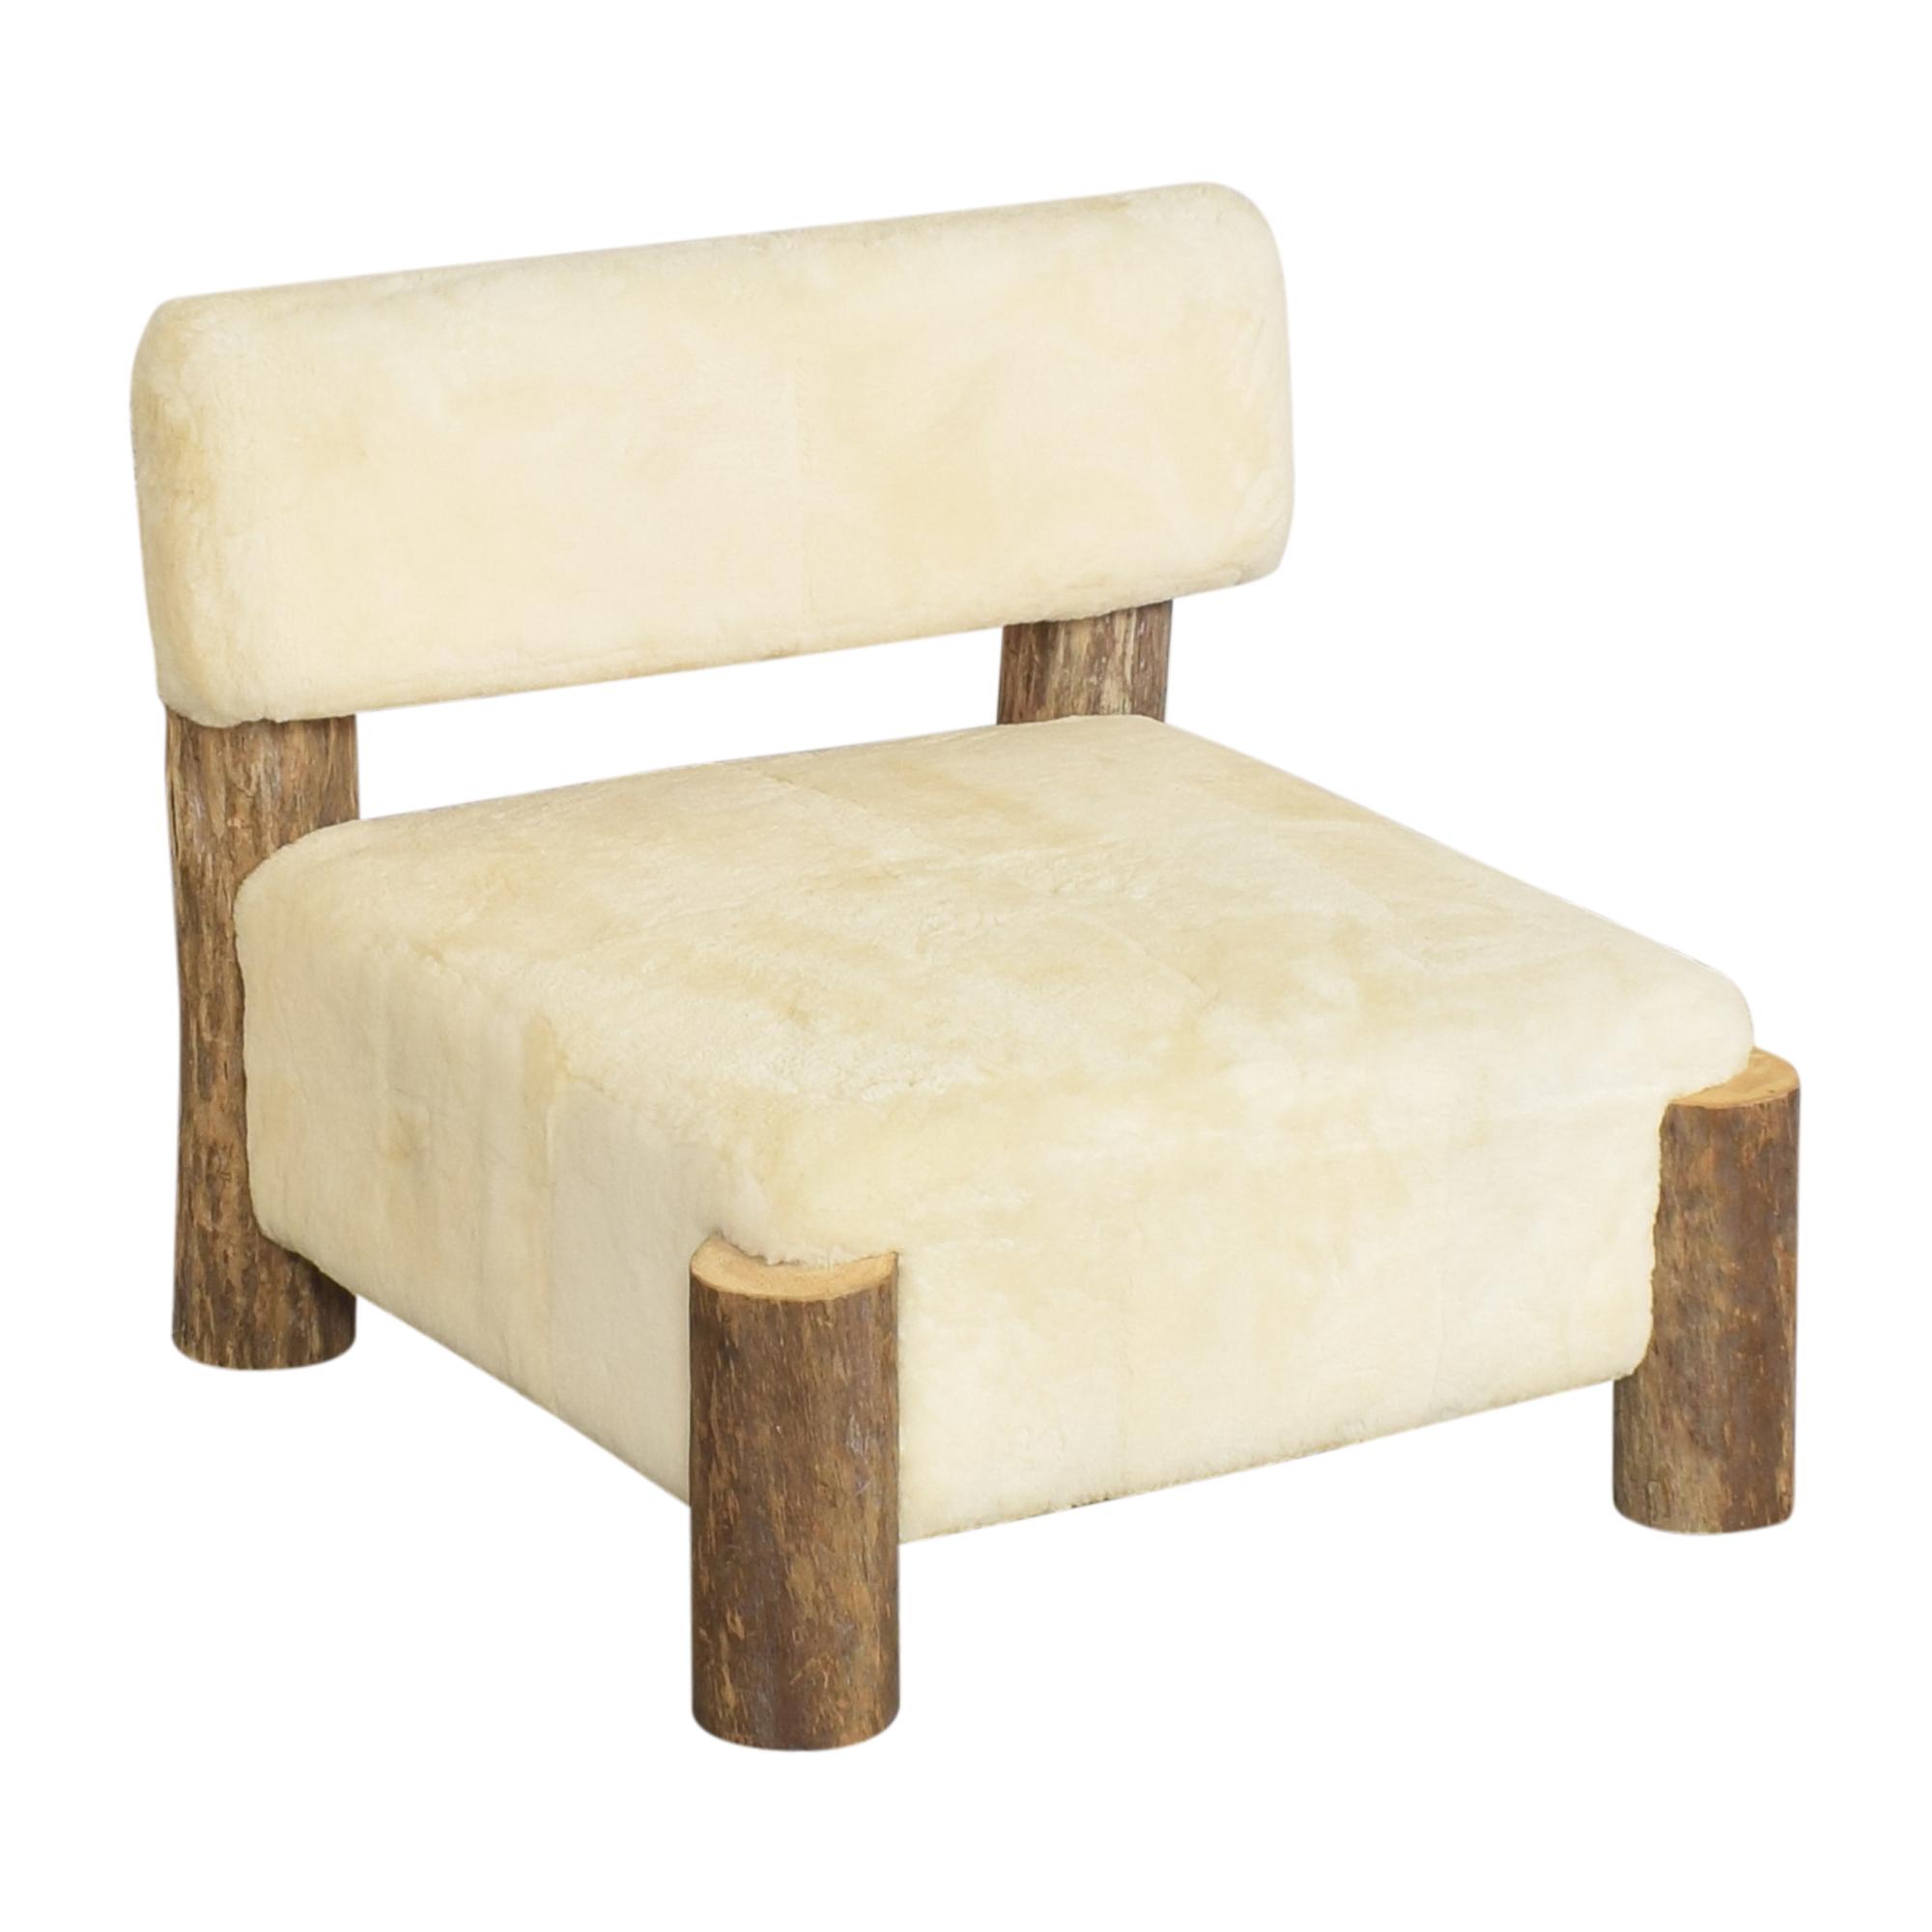 buy Four Hands Tsalagi Slipper Chair Four Hands